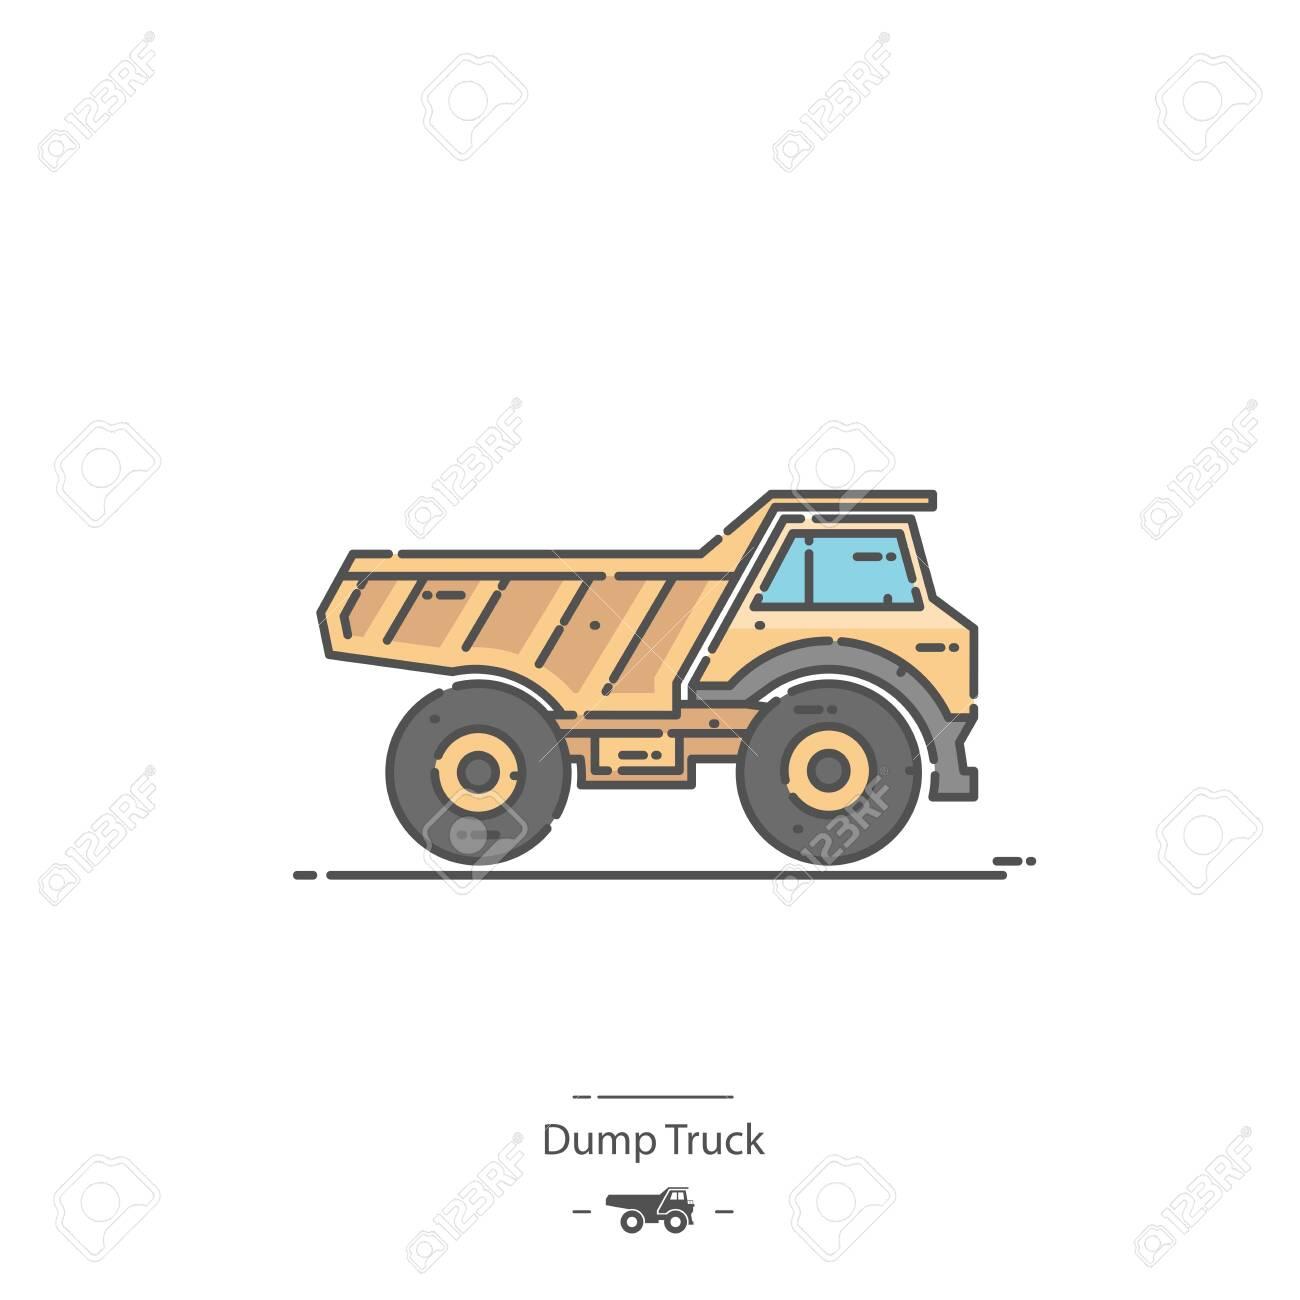 Dump Truck - Line color icon - 132234609